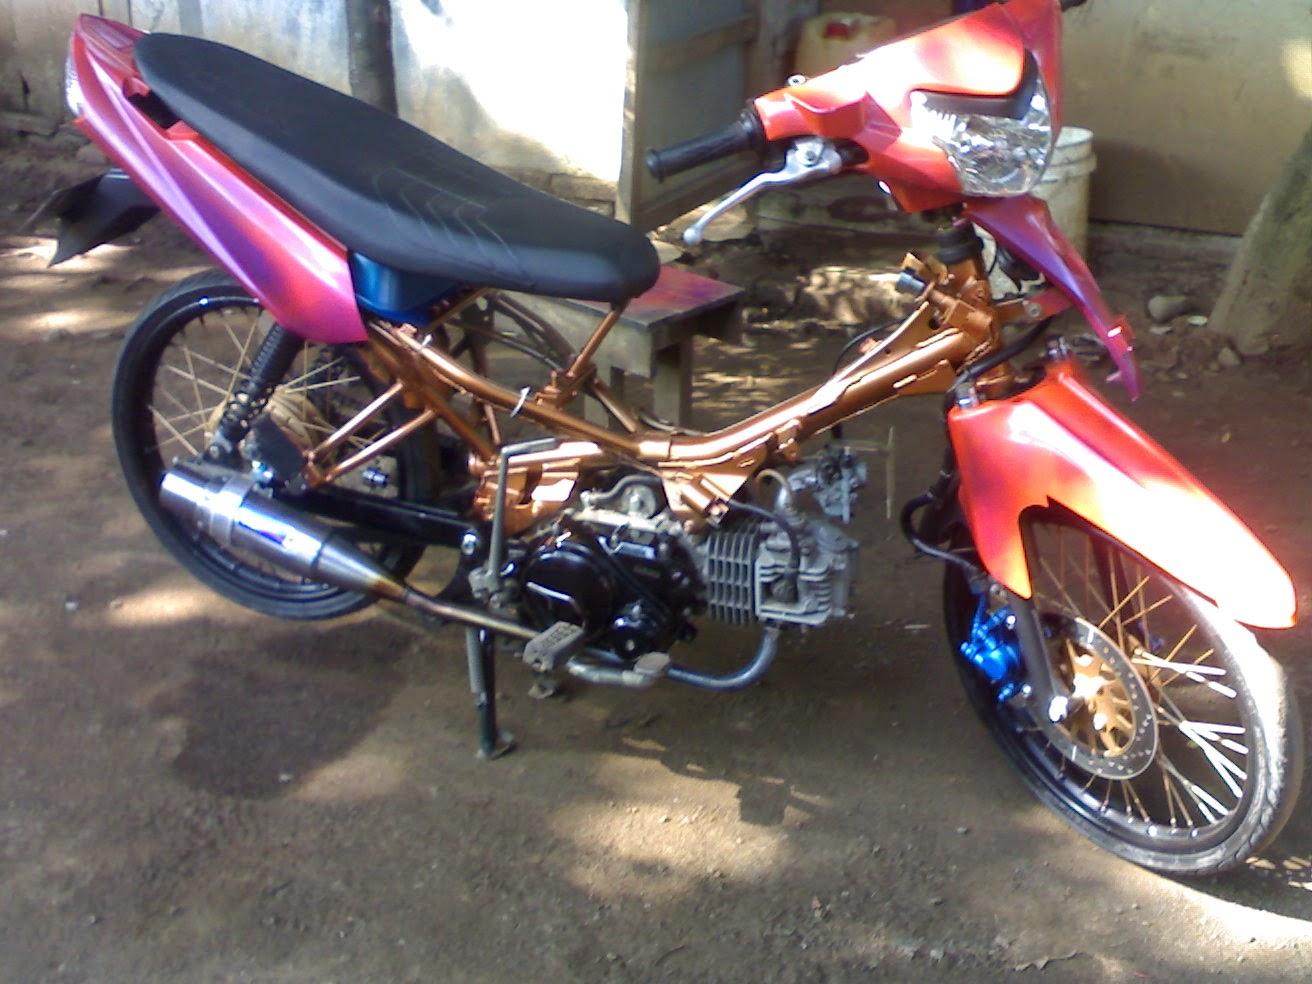 85 Modifikasi Motor Vega Zr Airbrush Terunik Kuroko Motor